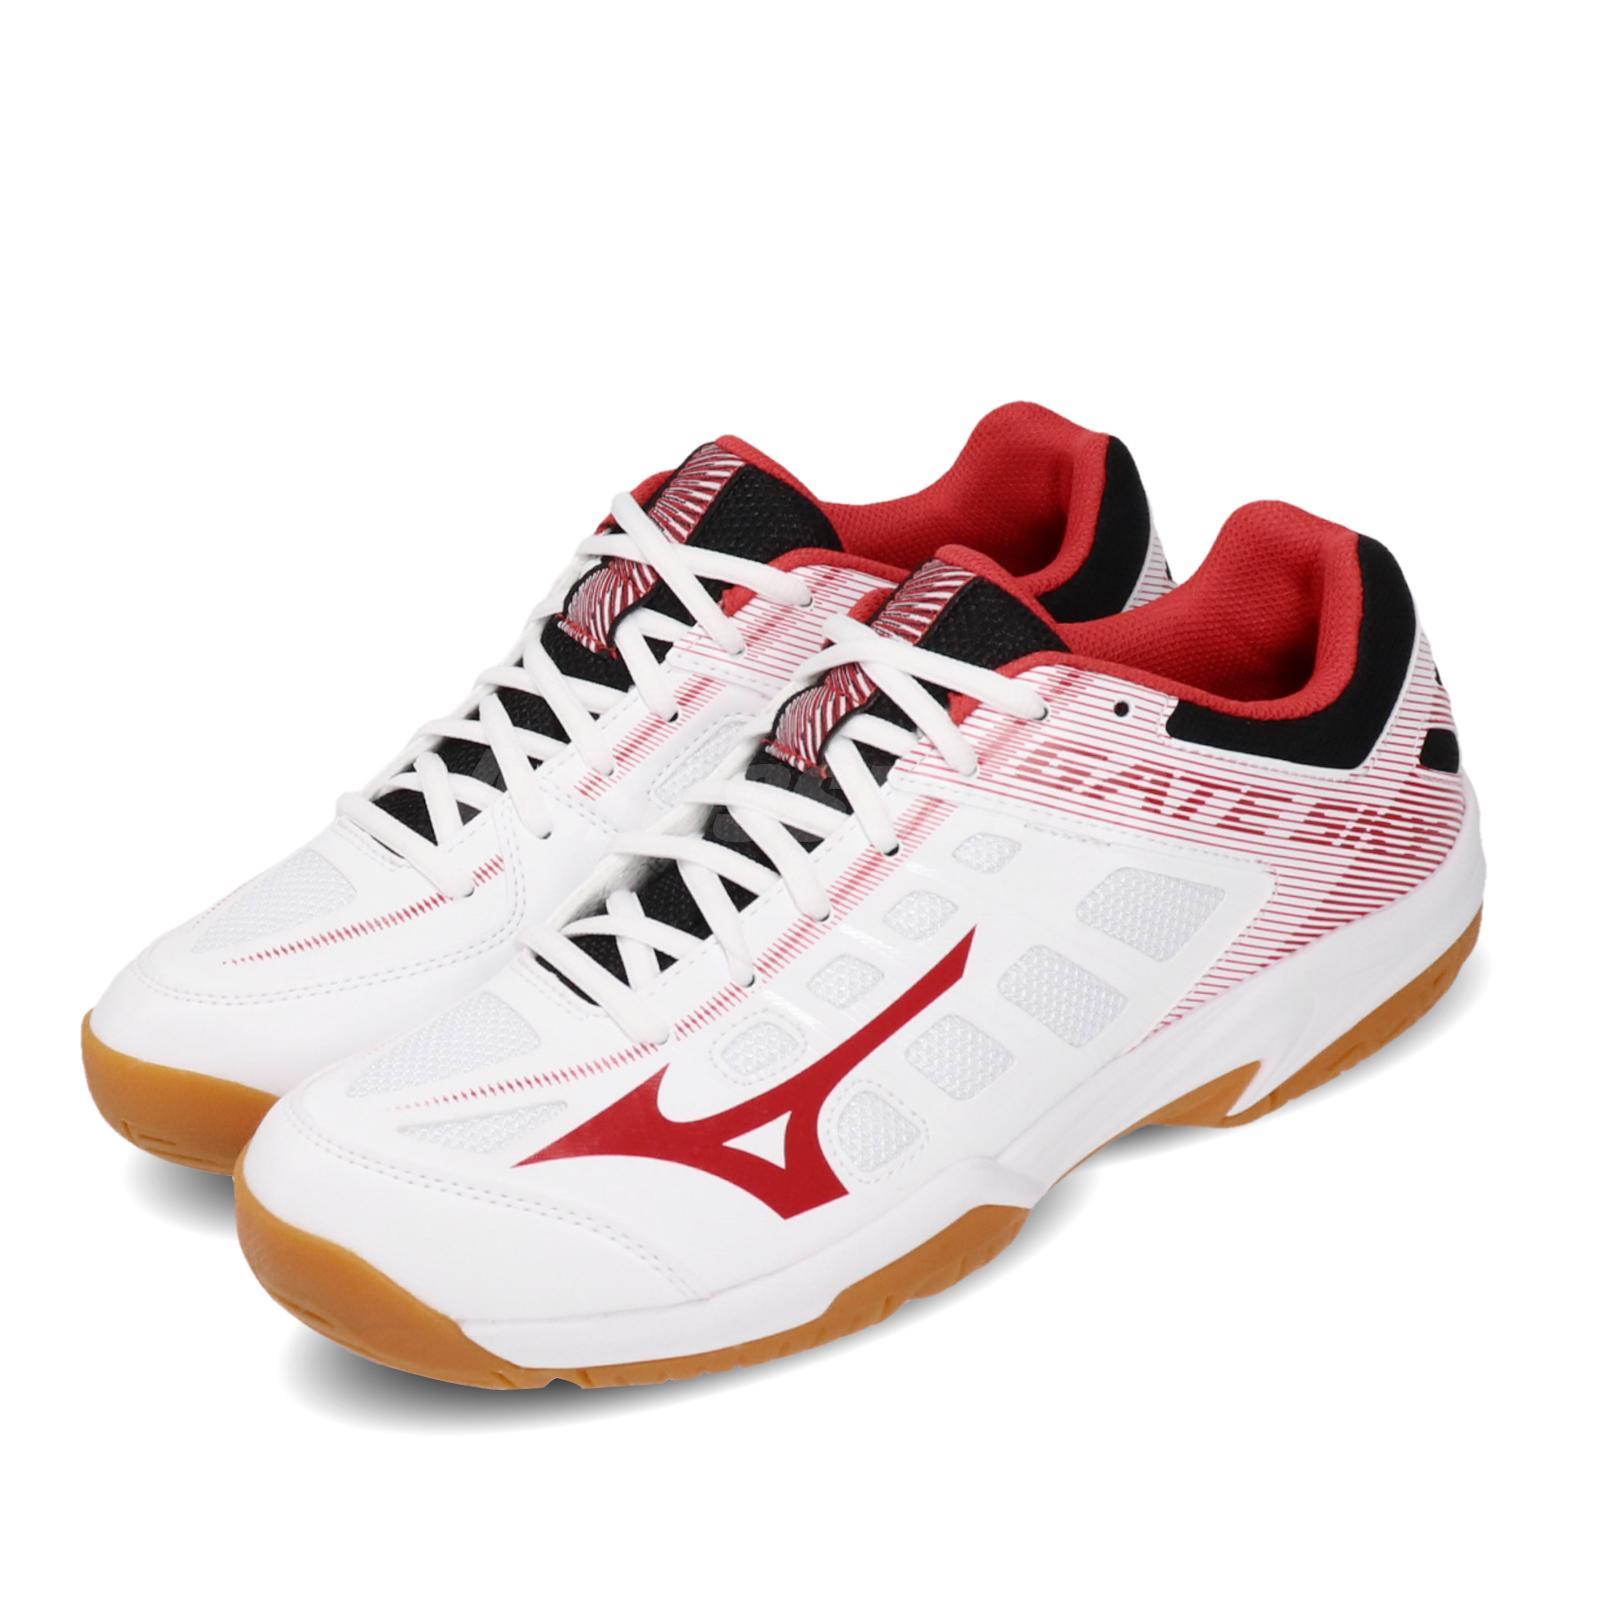 mizuno badminton shoes size 10 herren